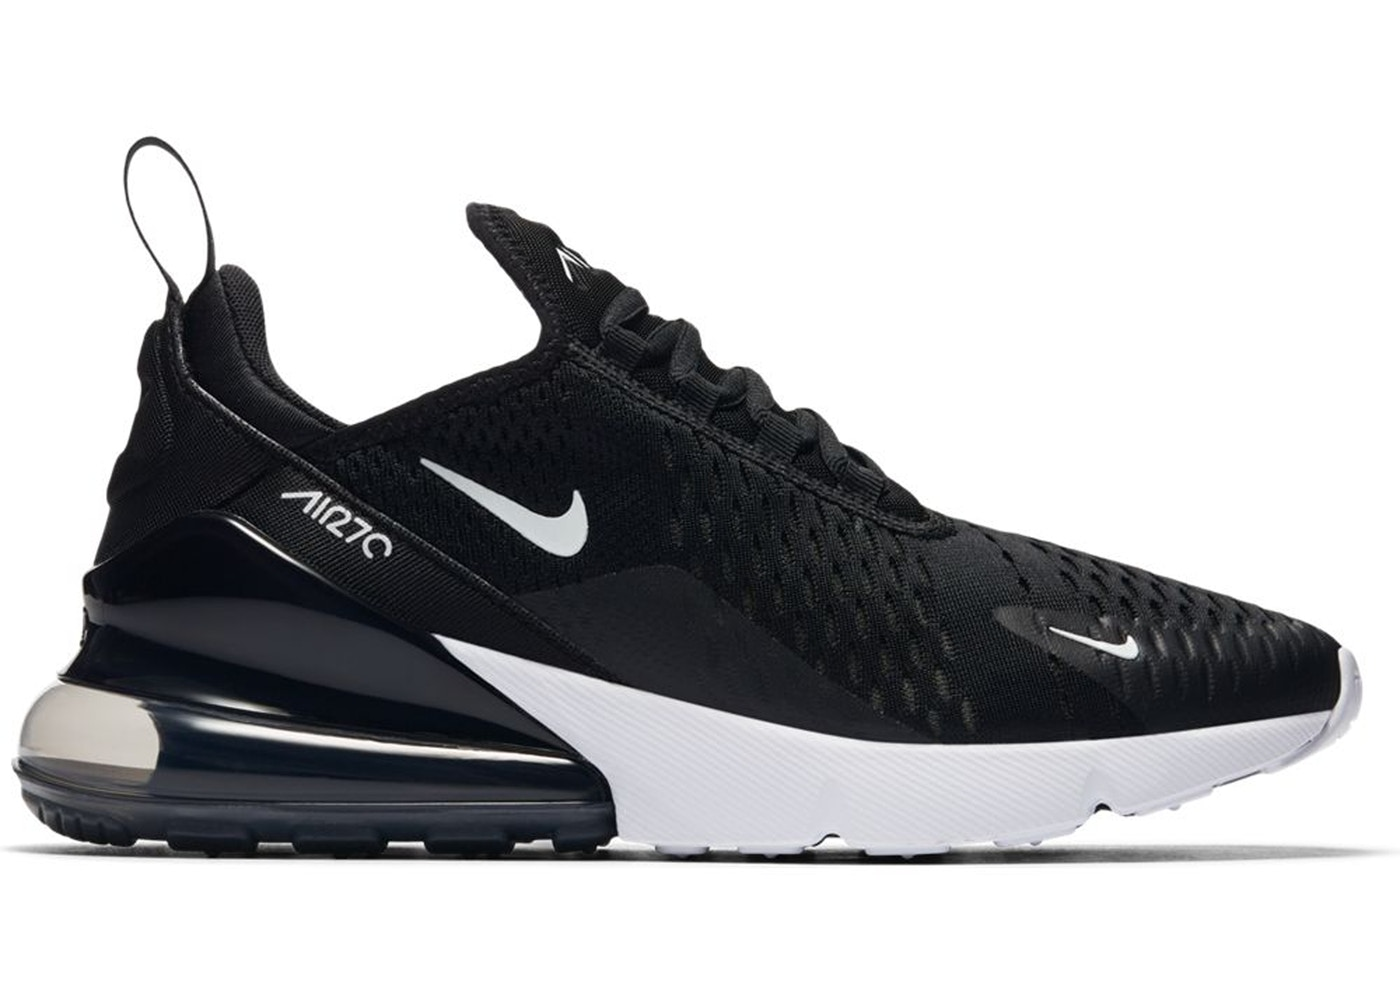 Nike Air Max 270 Black White (W)